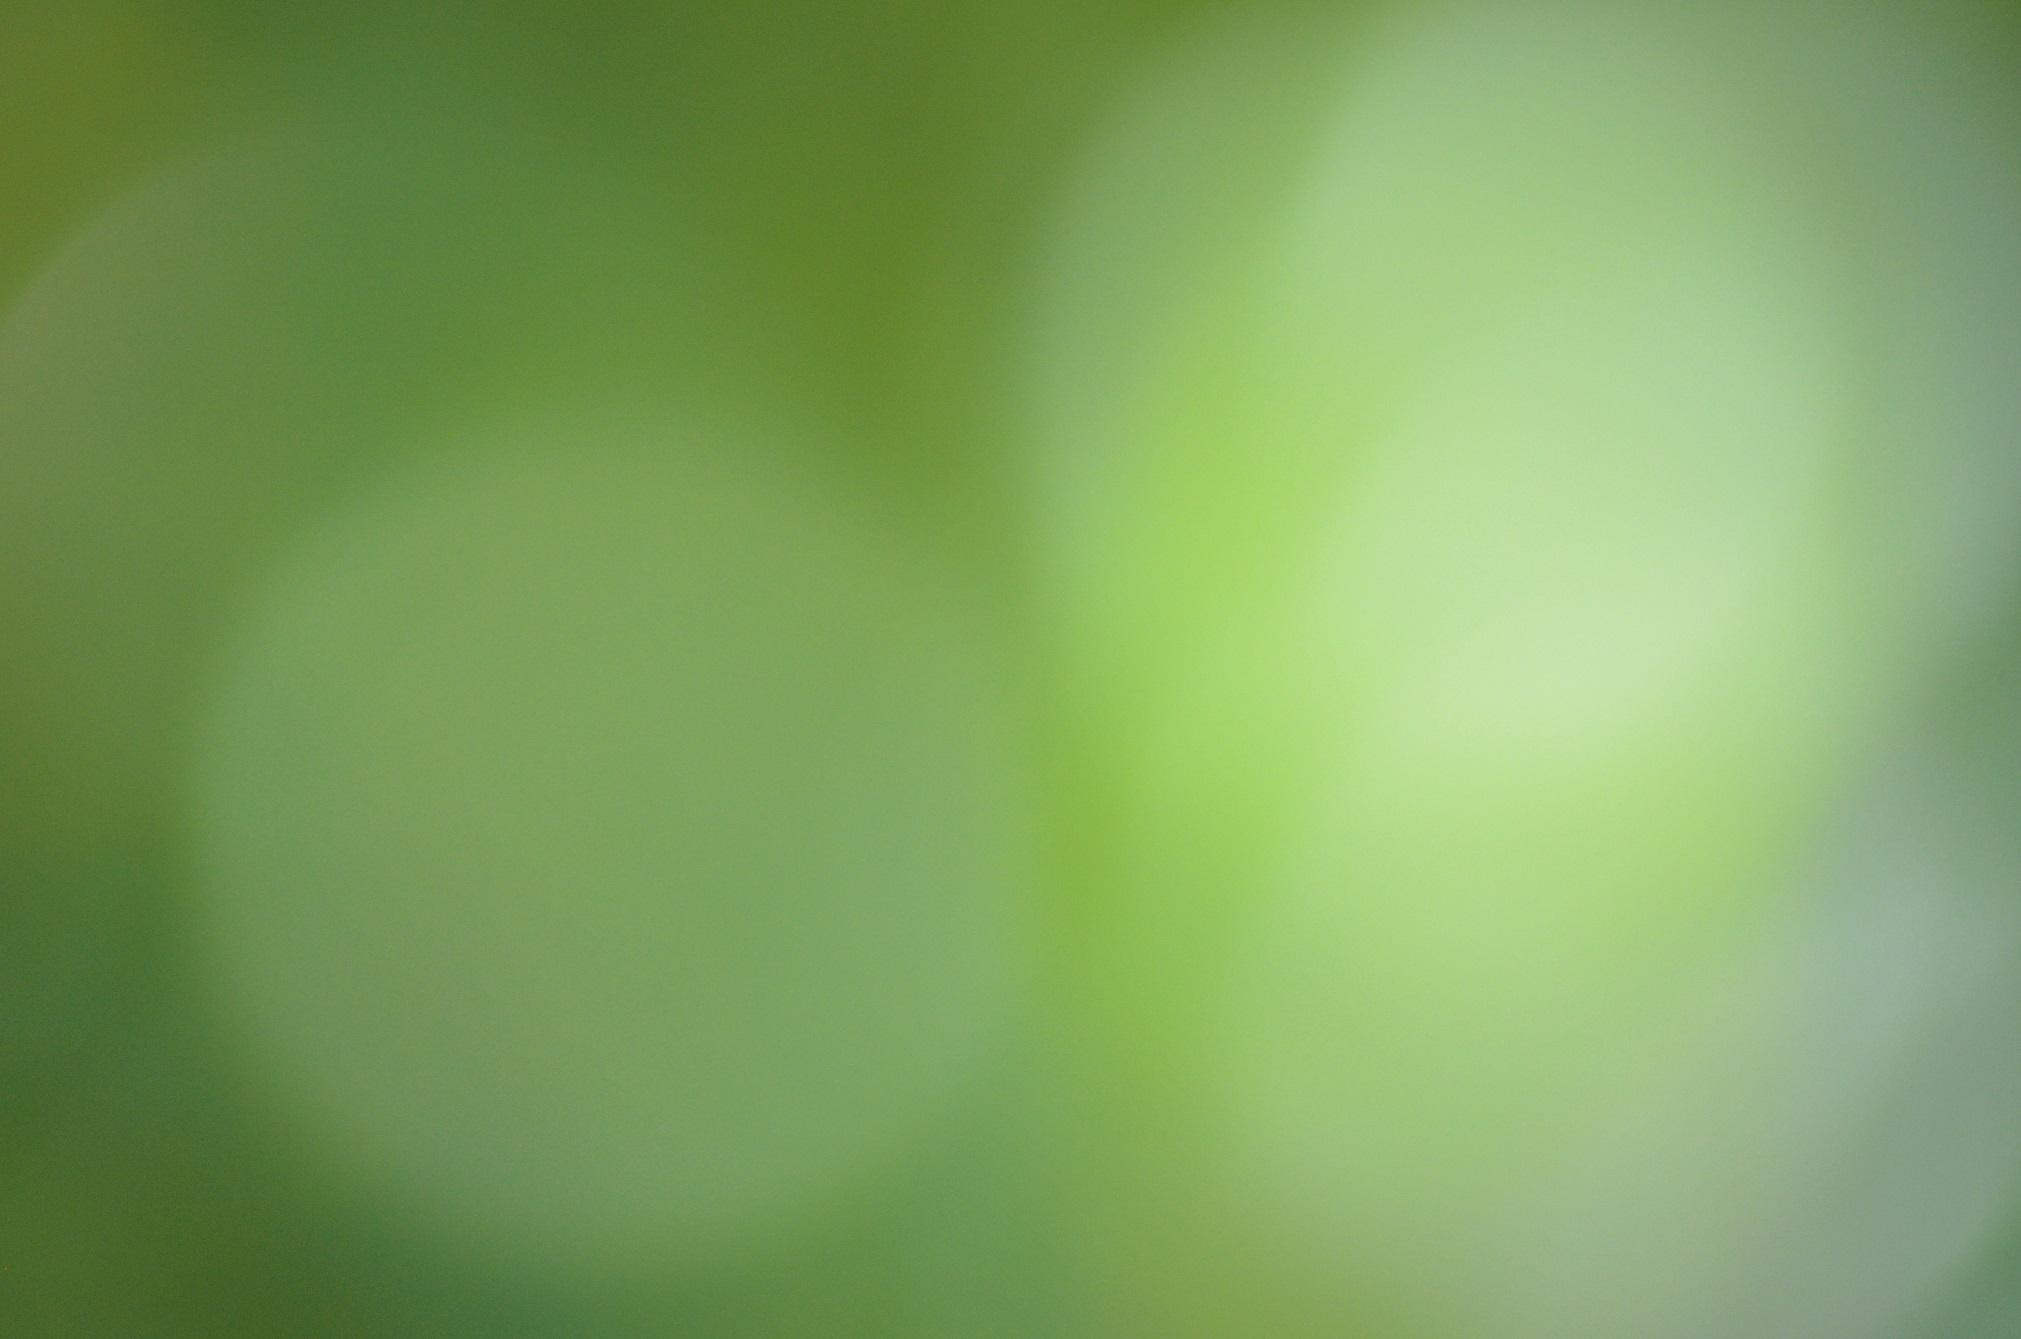 Circle Gradient Green Light 2021x1339